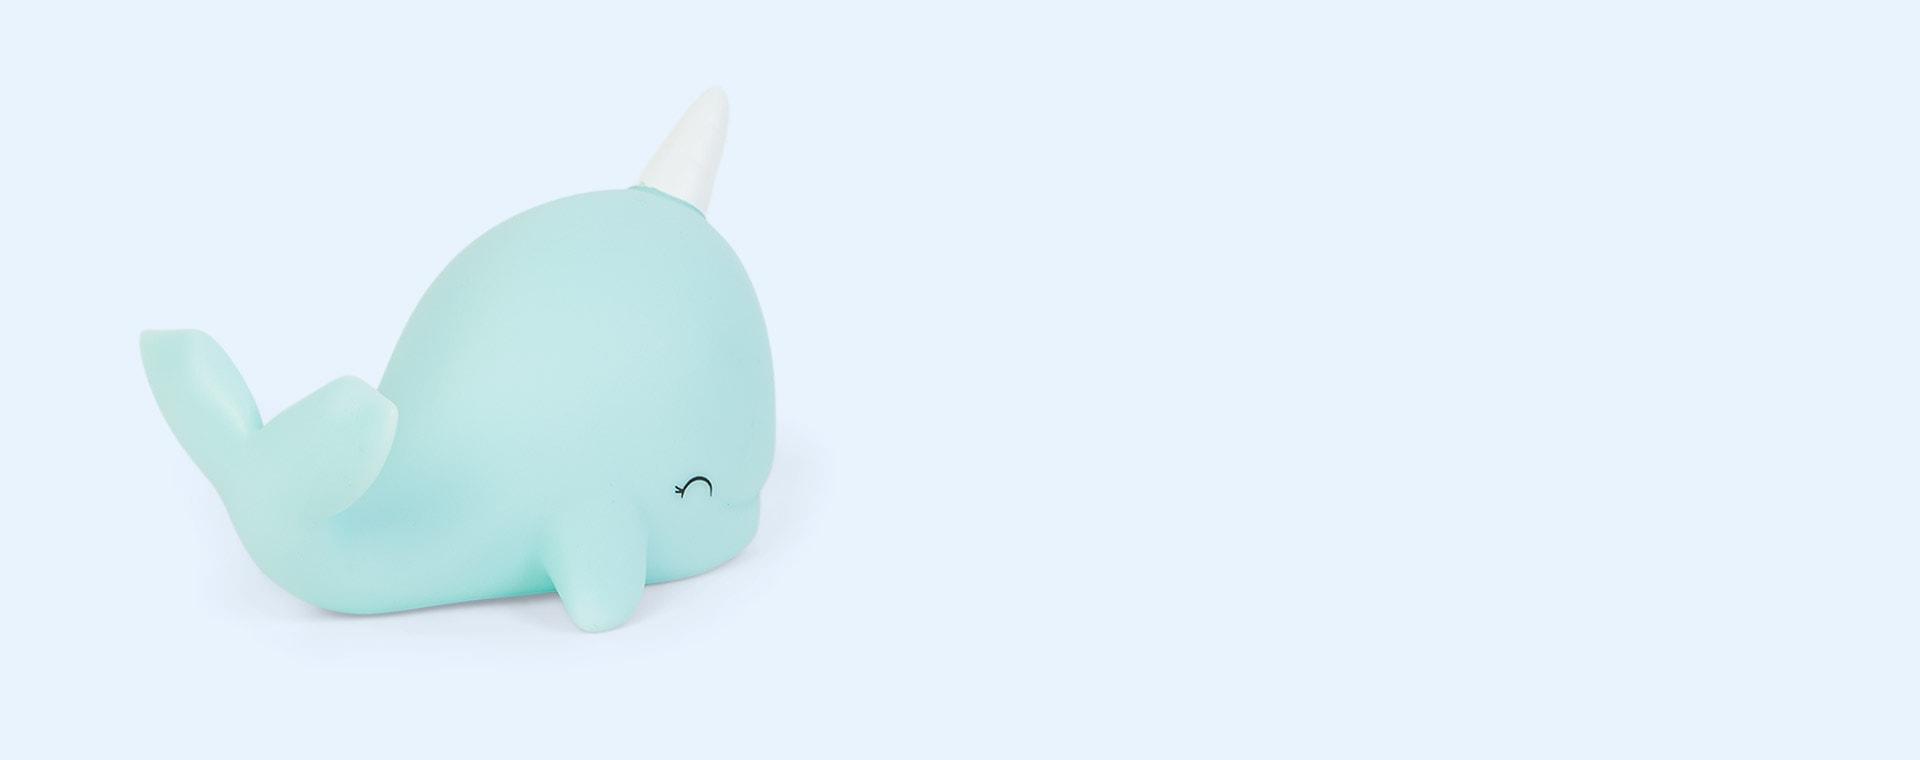 Pastel Blue Narwhal With White Horn Dhink Mini LED Night Light